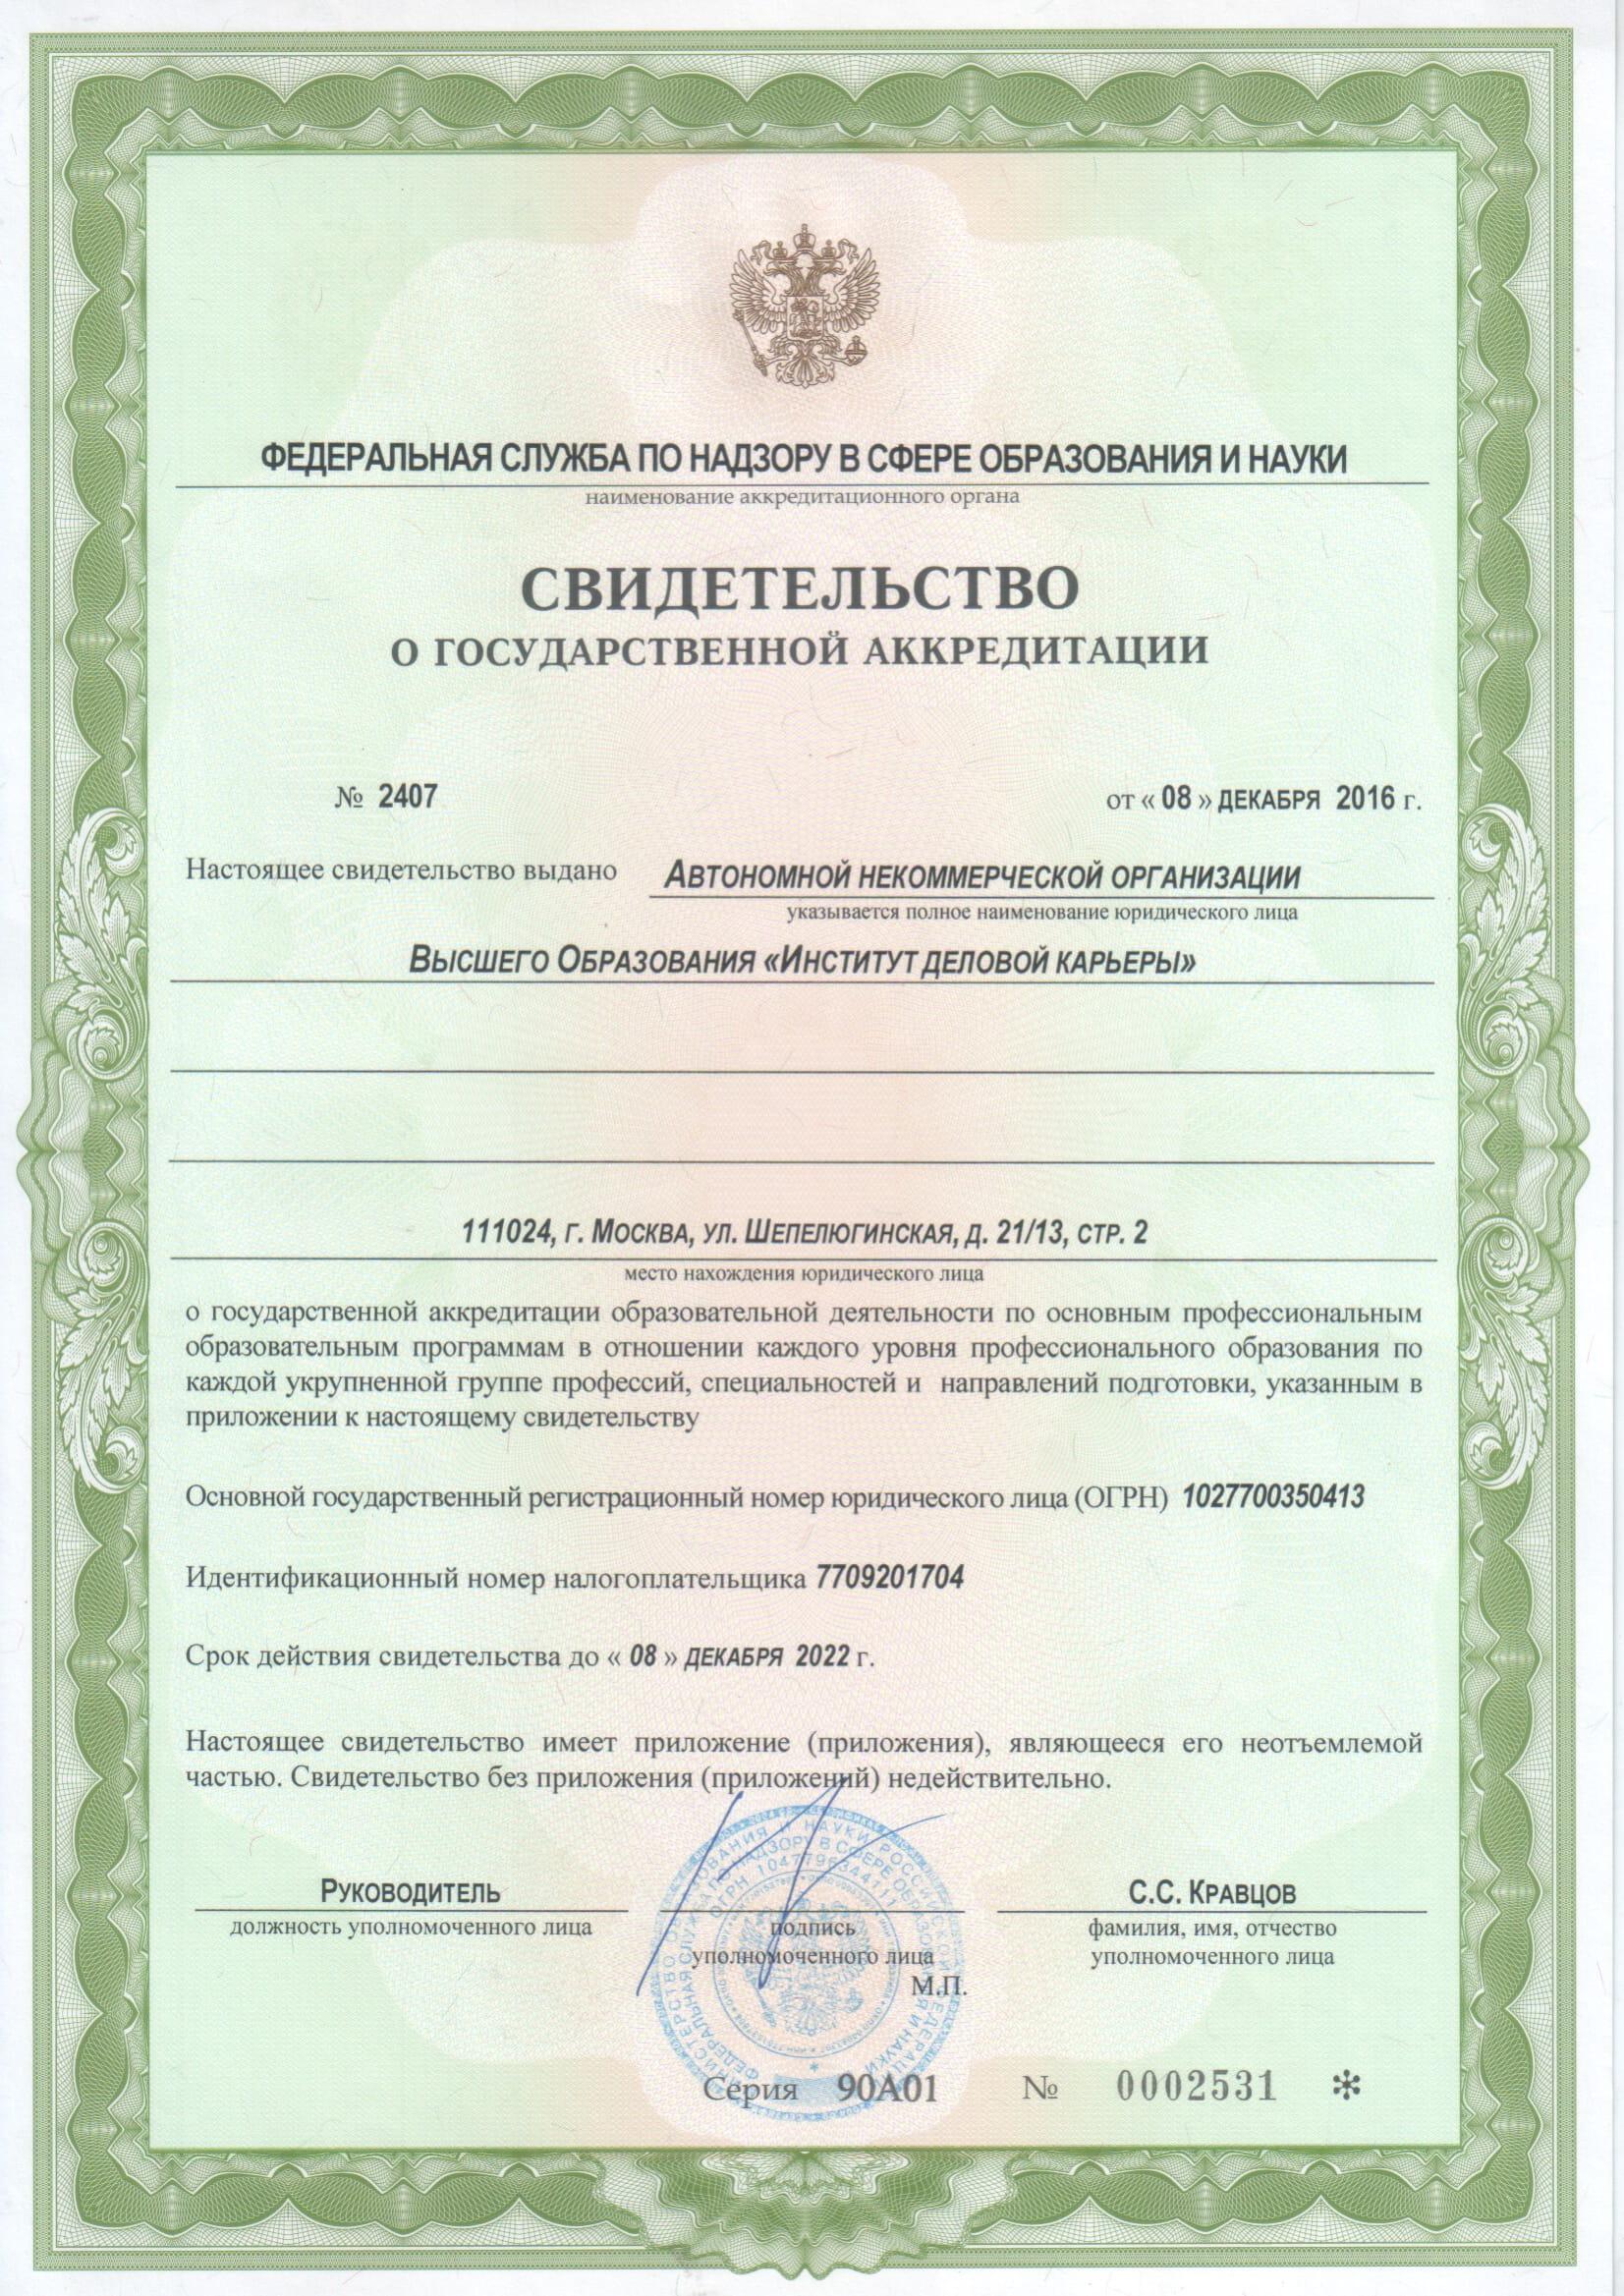 http://departamentvpo.ru/wp-content/uploads/2017/04/Akkreditacia_s_prilosheniem-1.jpg